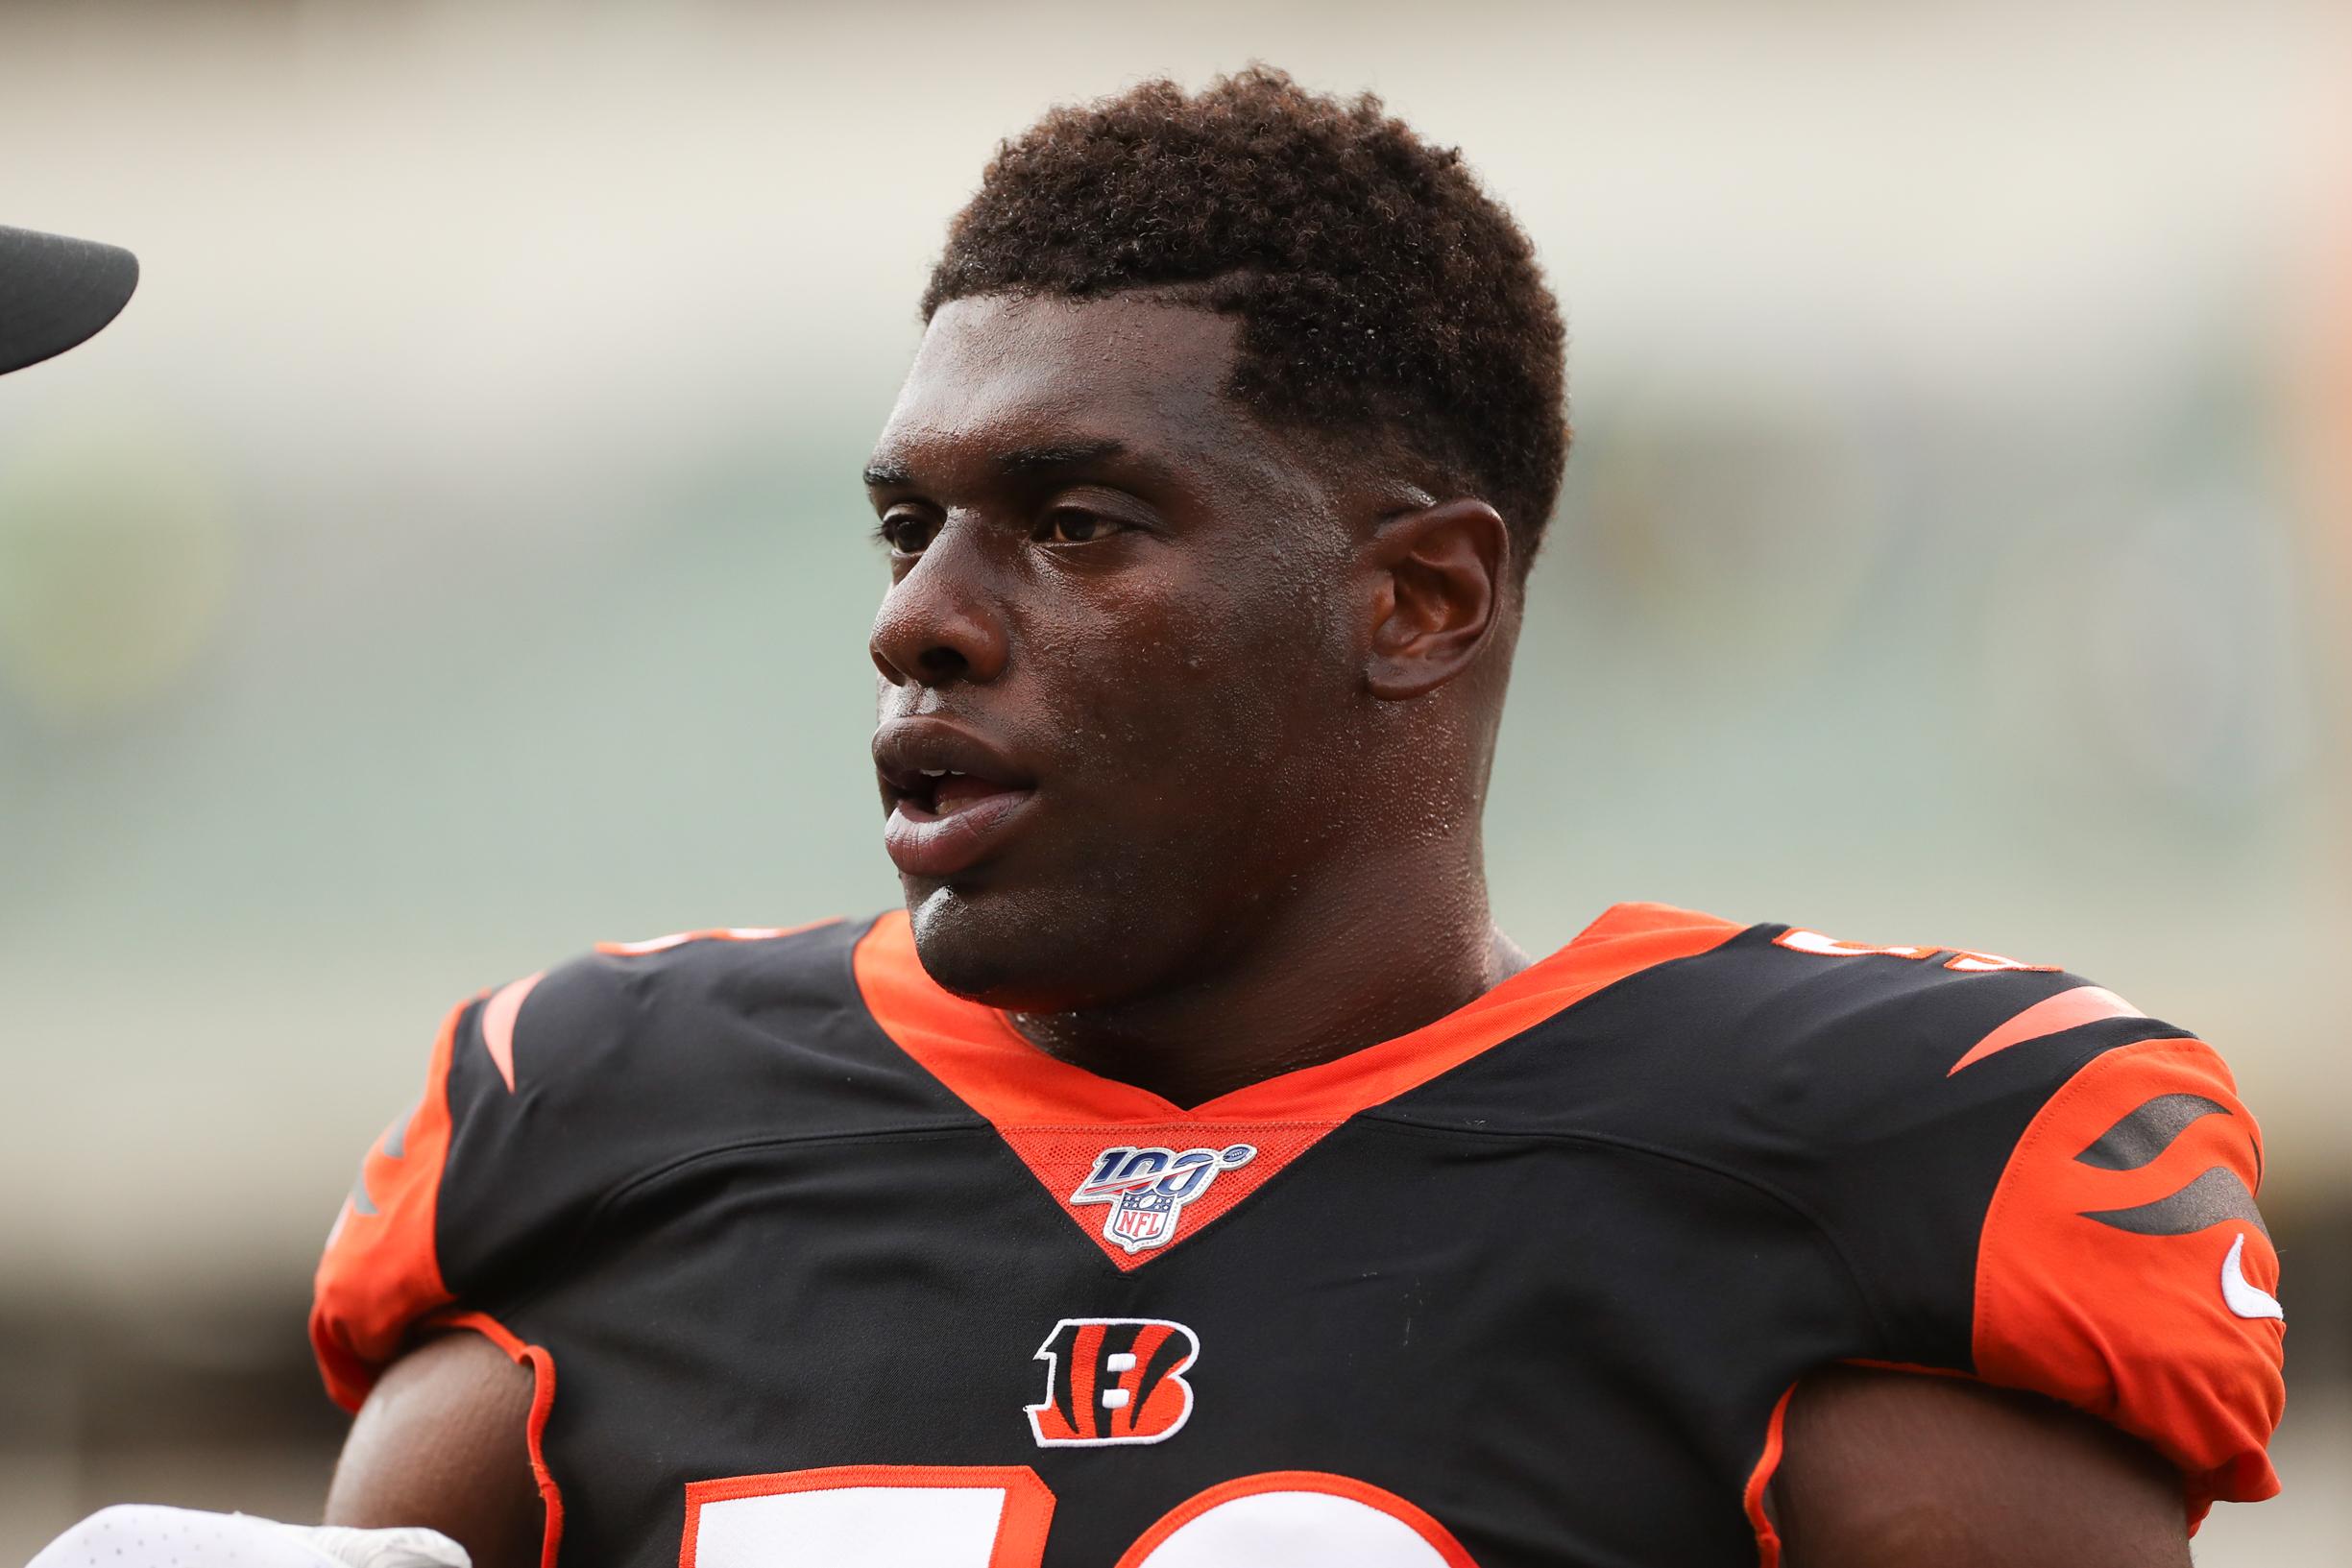 NFL: AUG 22 Preseason - Giants at Bengals